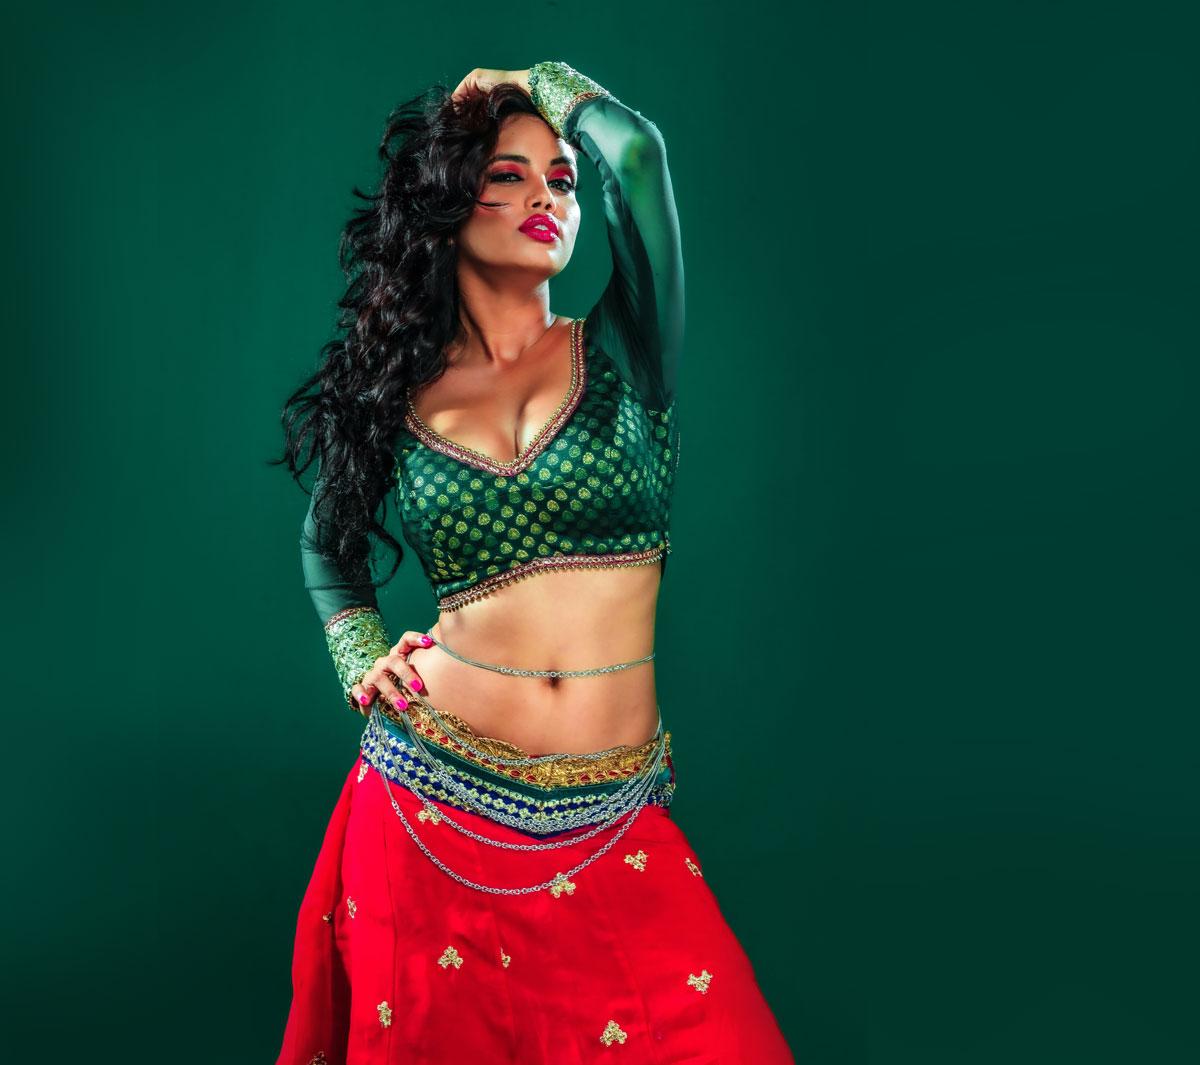 Wonderful Indian Bride